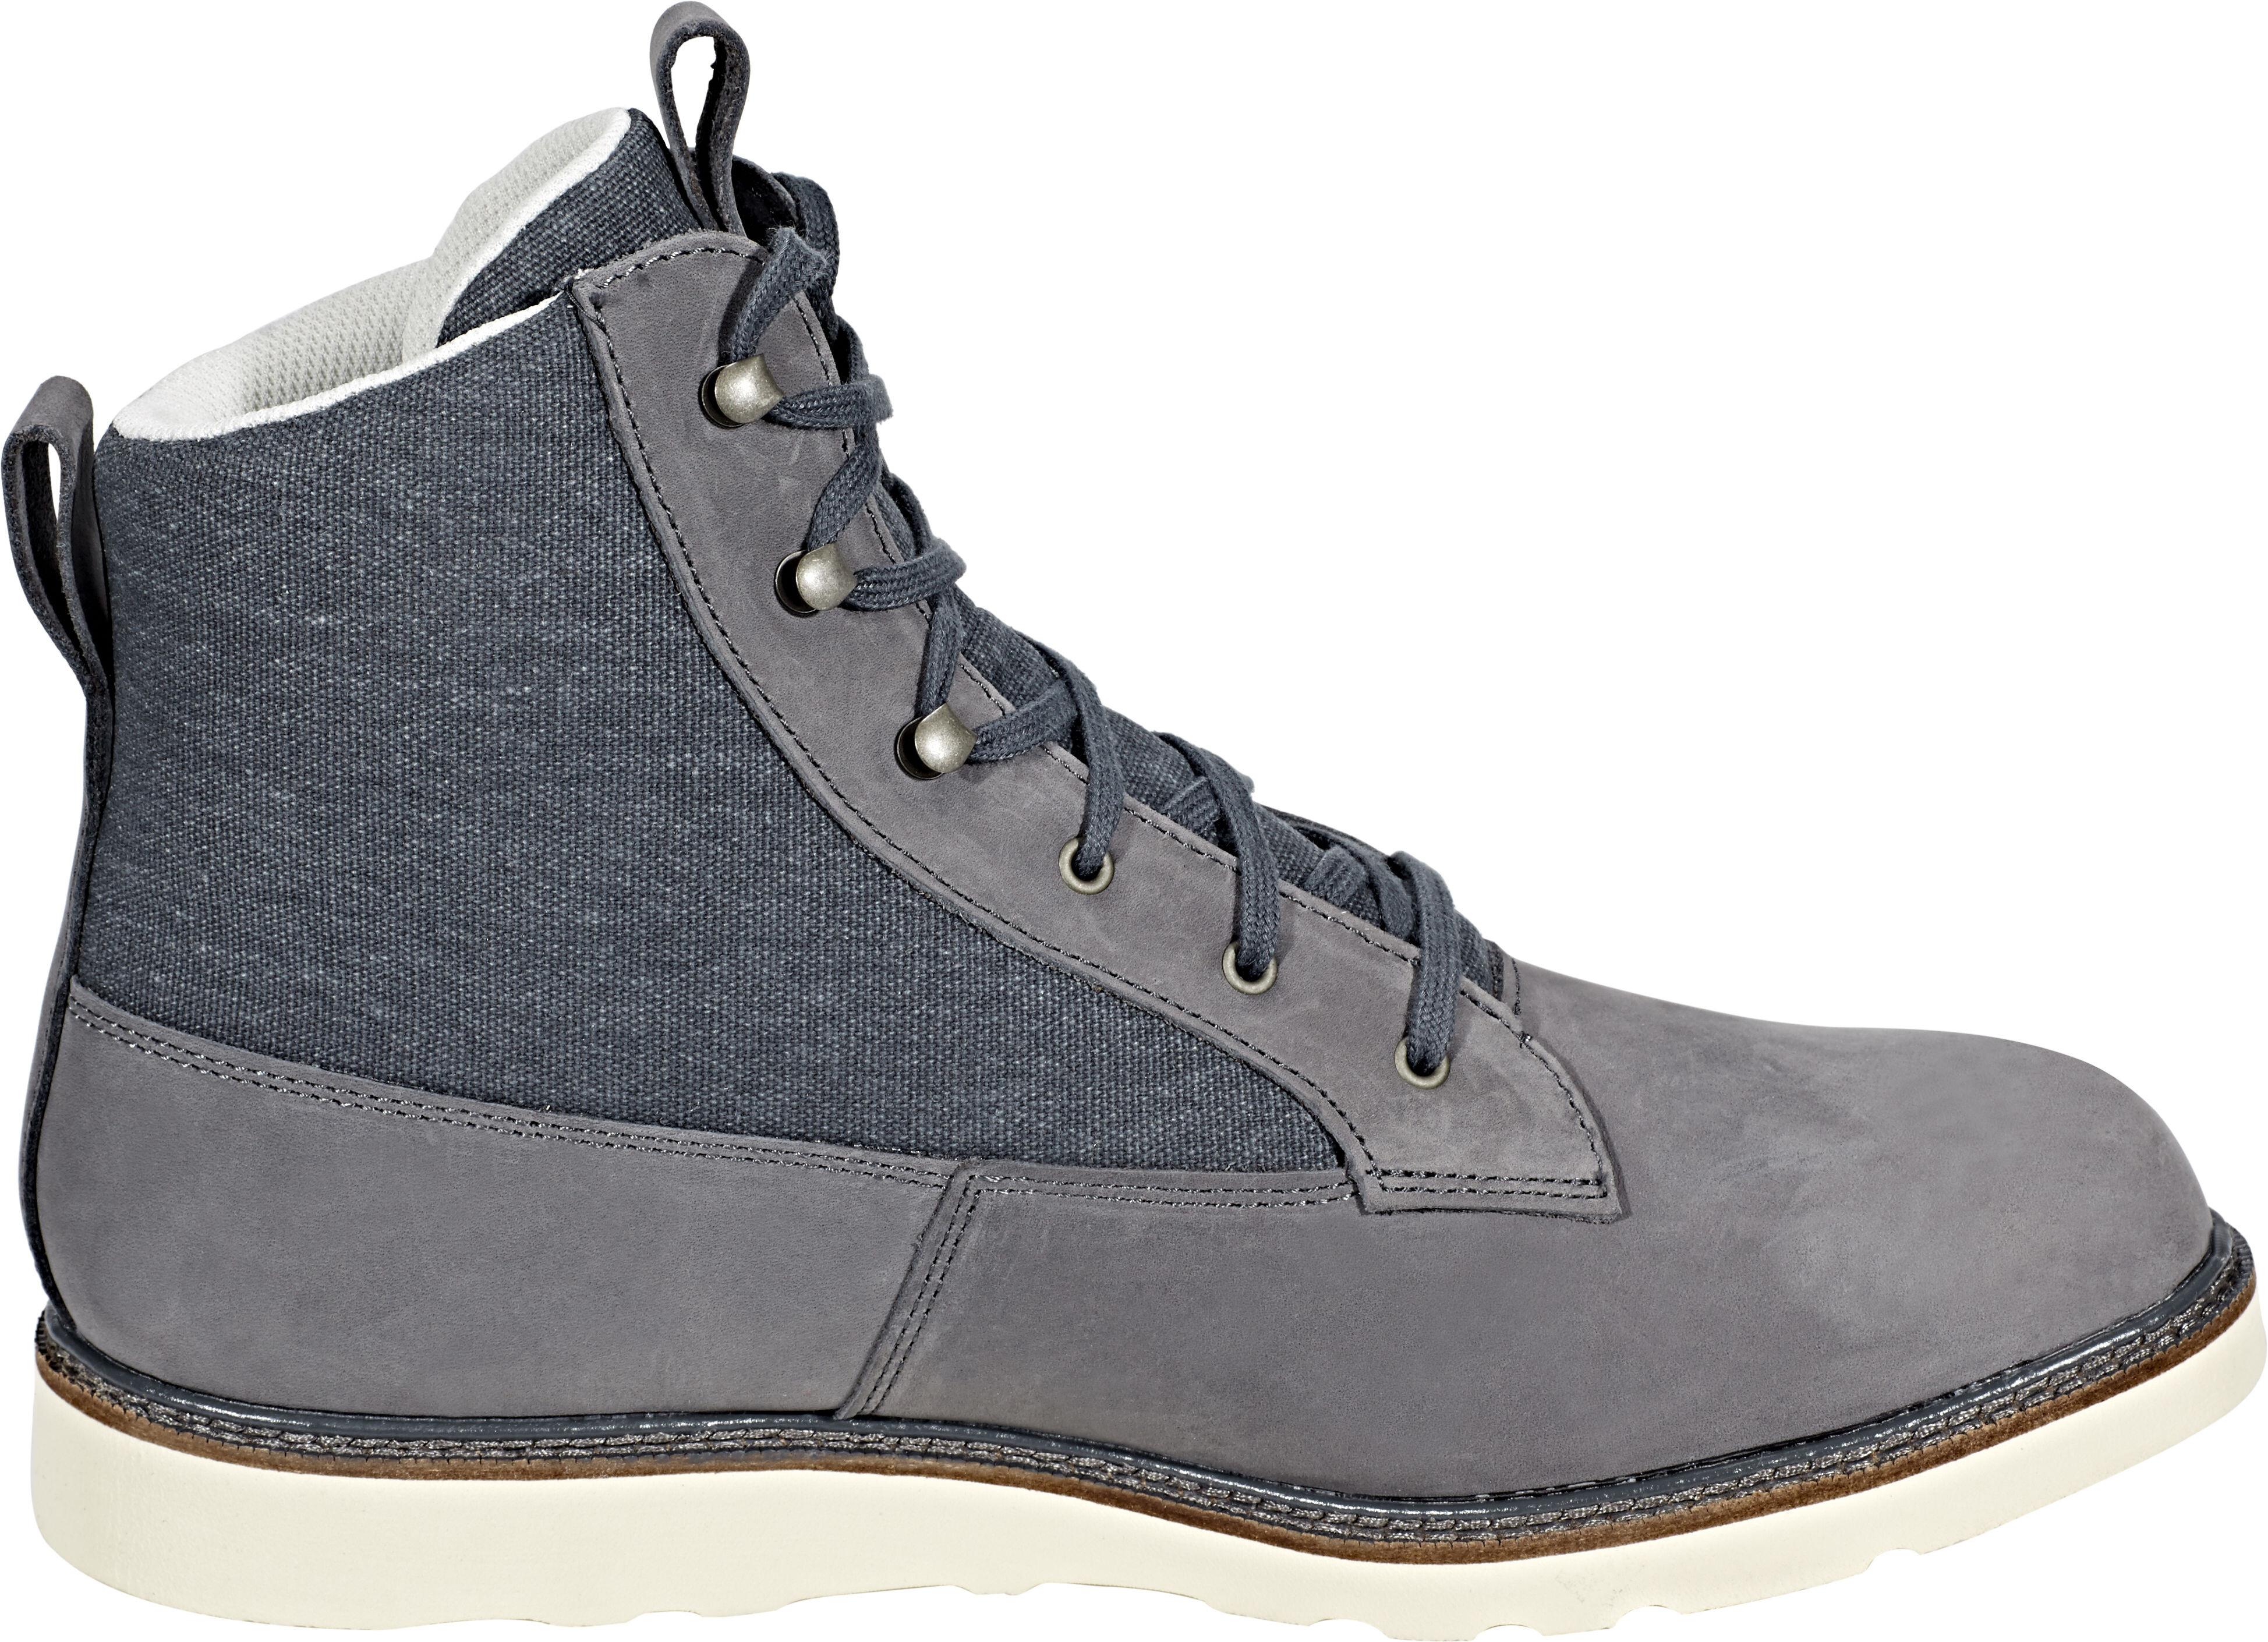 97860ff3b8c332 Dachstein Andi DDS Shoes Men graphite ebony